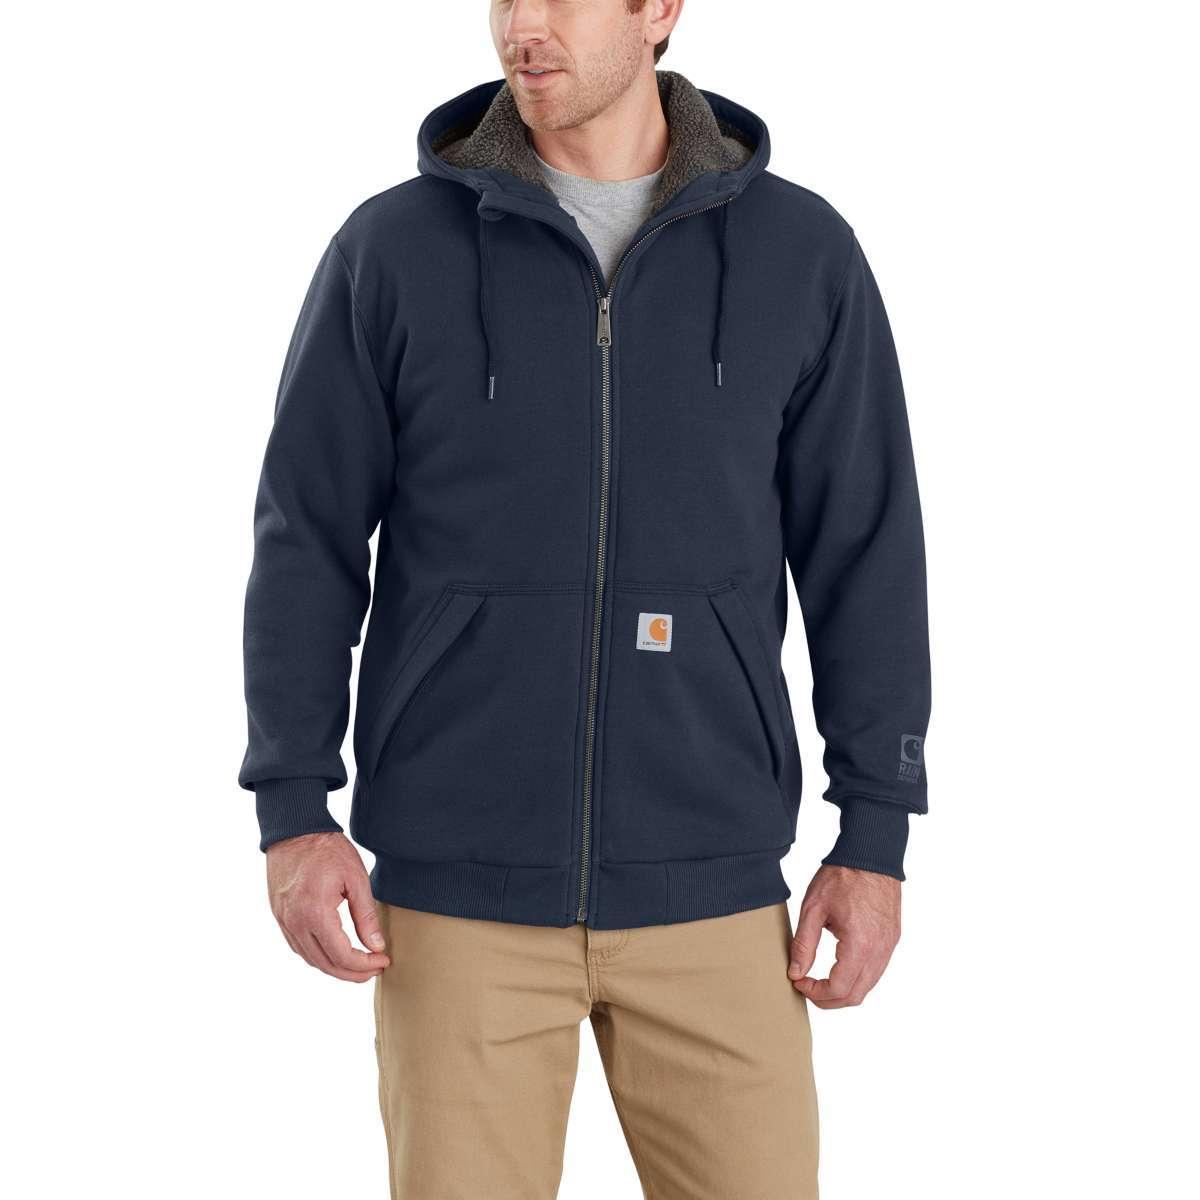 Carhartt Men's Rain Defender Rockland Sherpa-Lined Full-Zip Hoodie - Blue, M